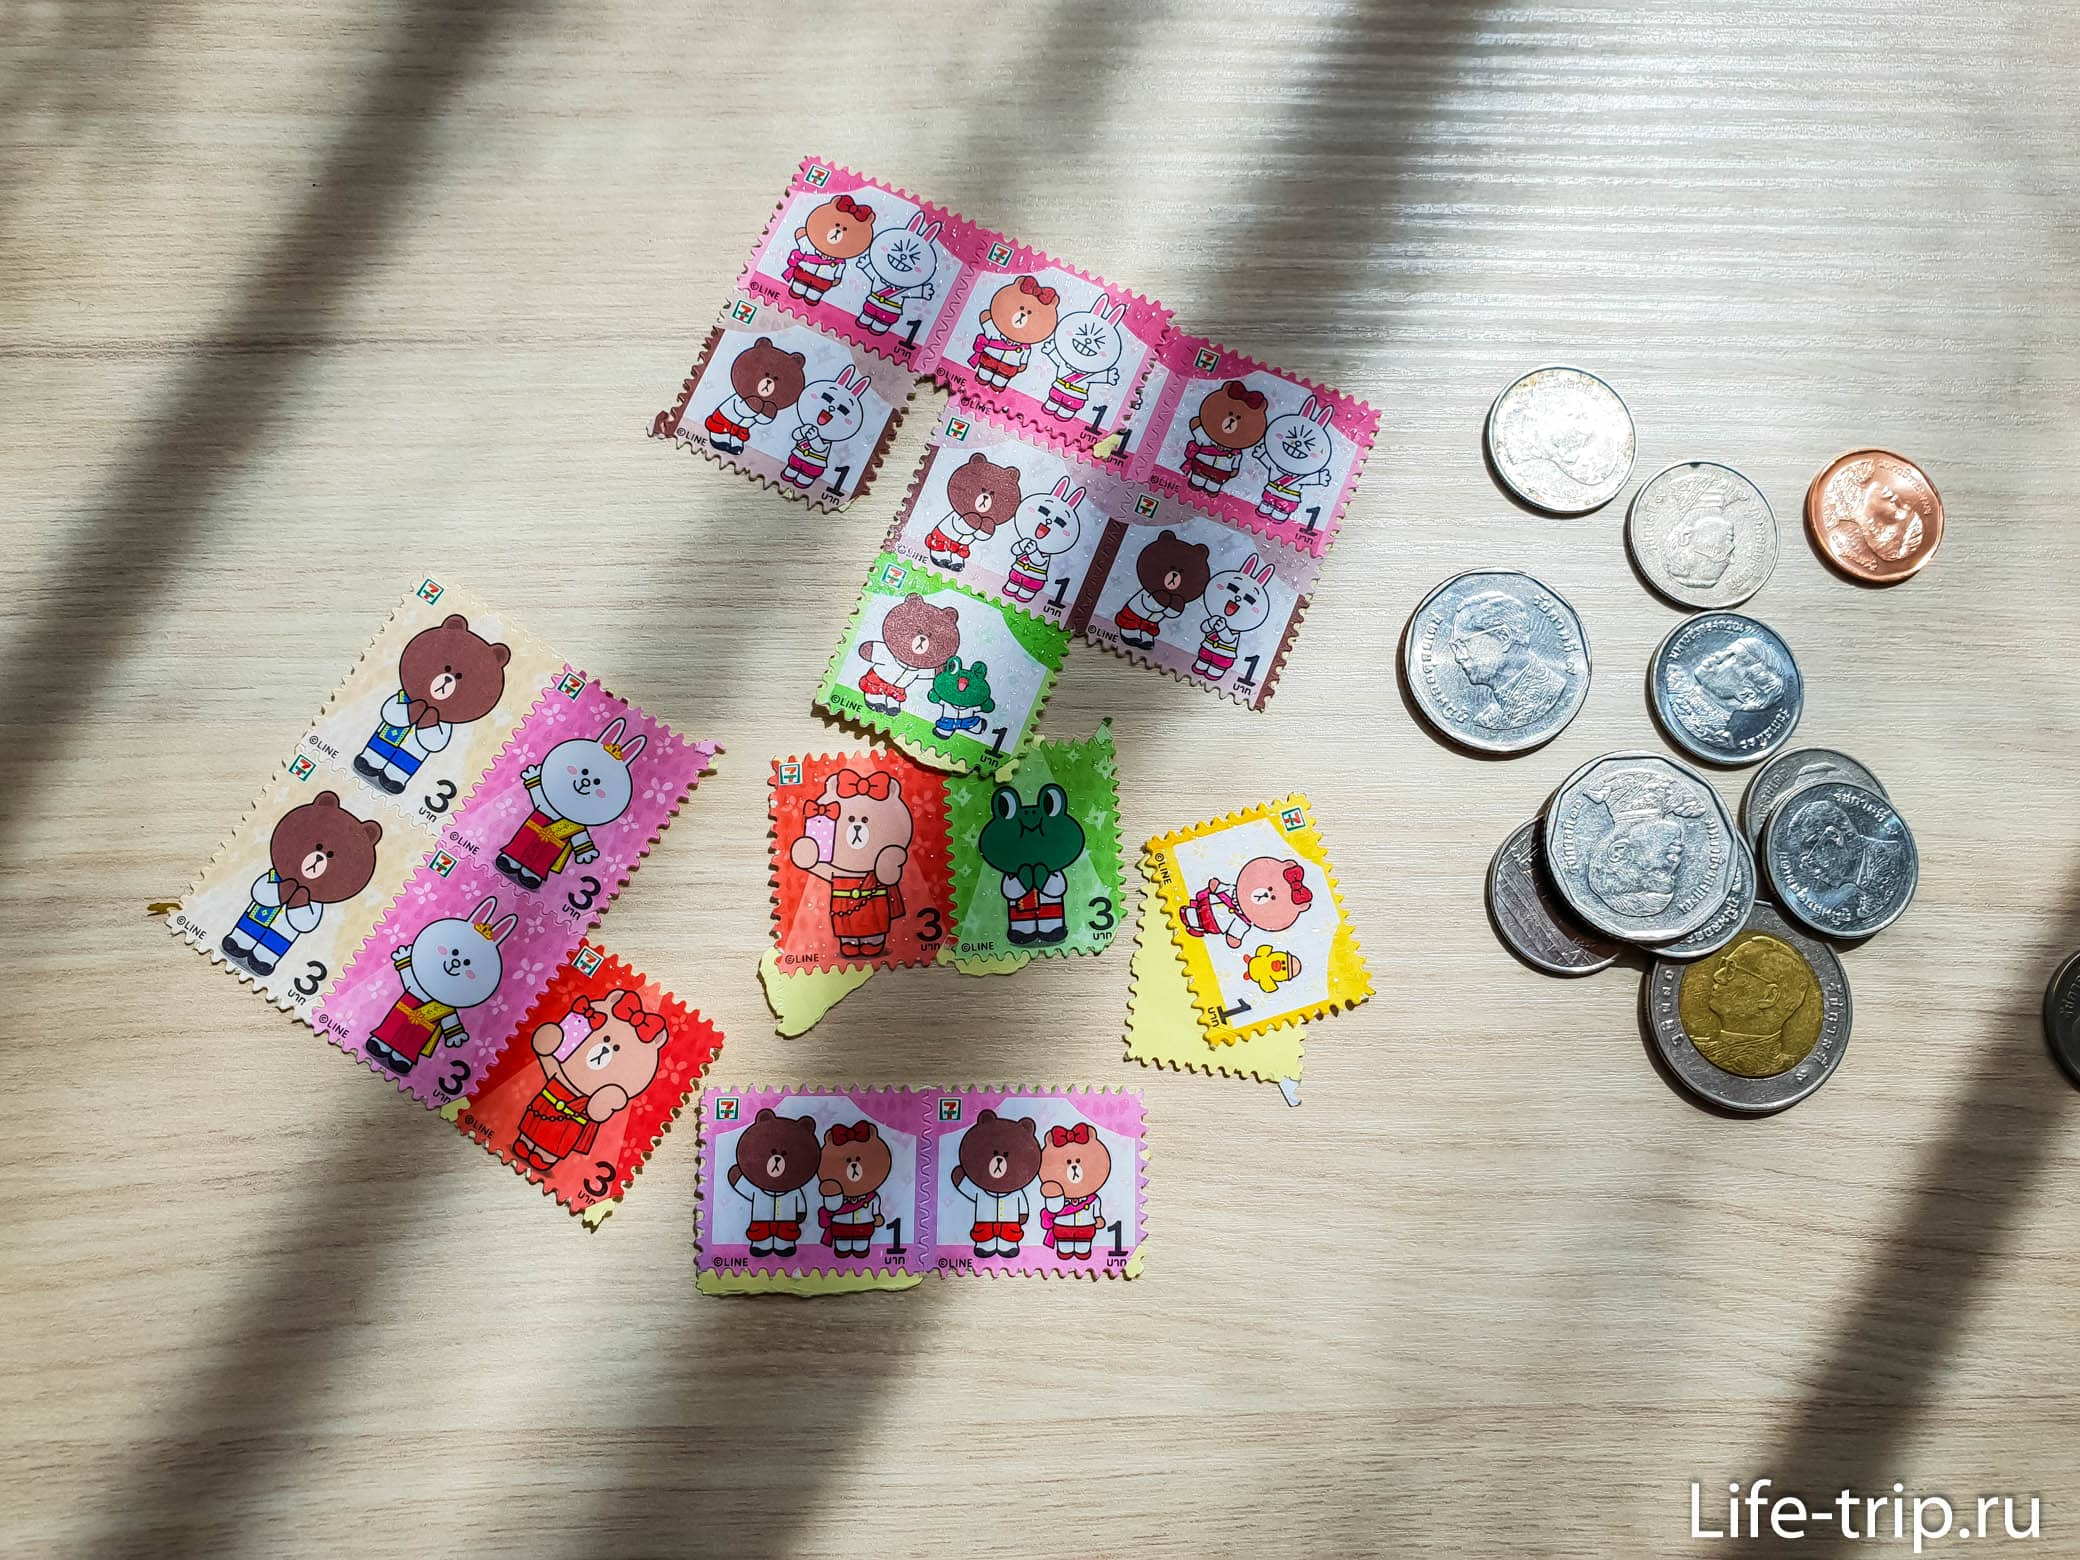 Наклейки из 7-Eleven в Таиланде